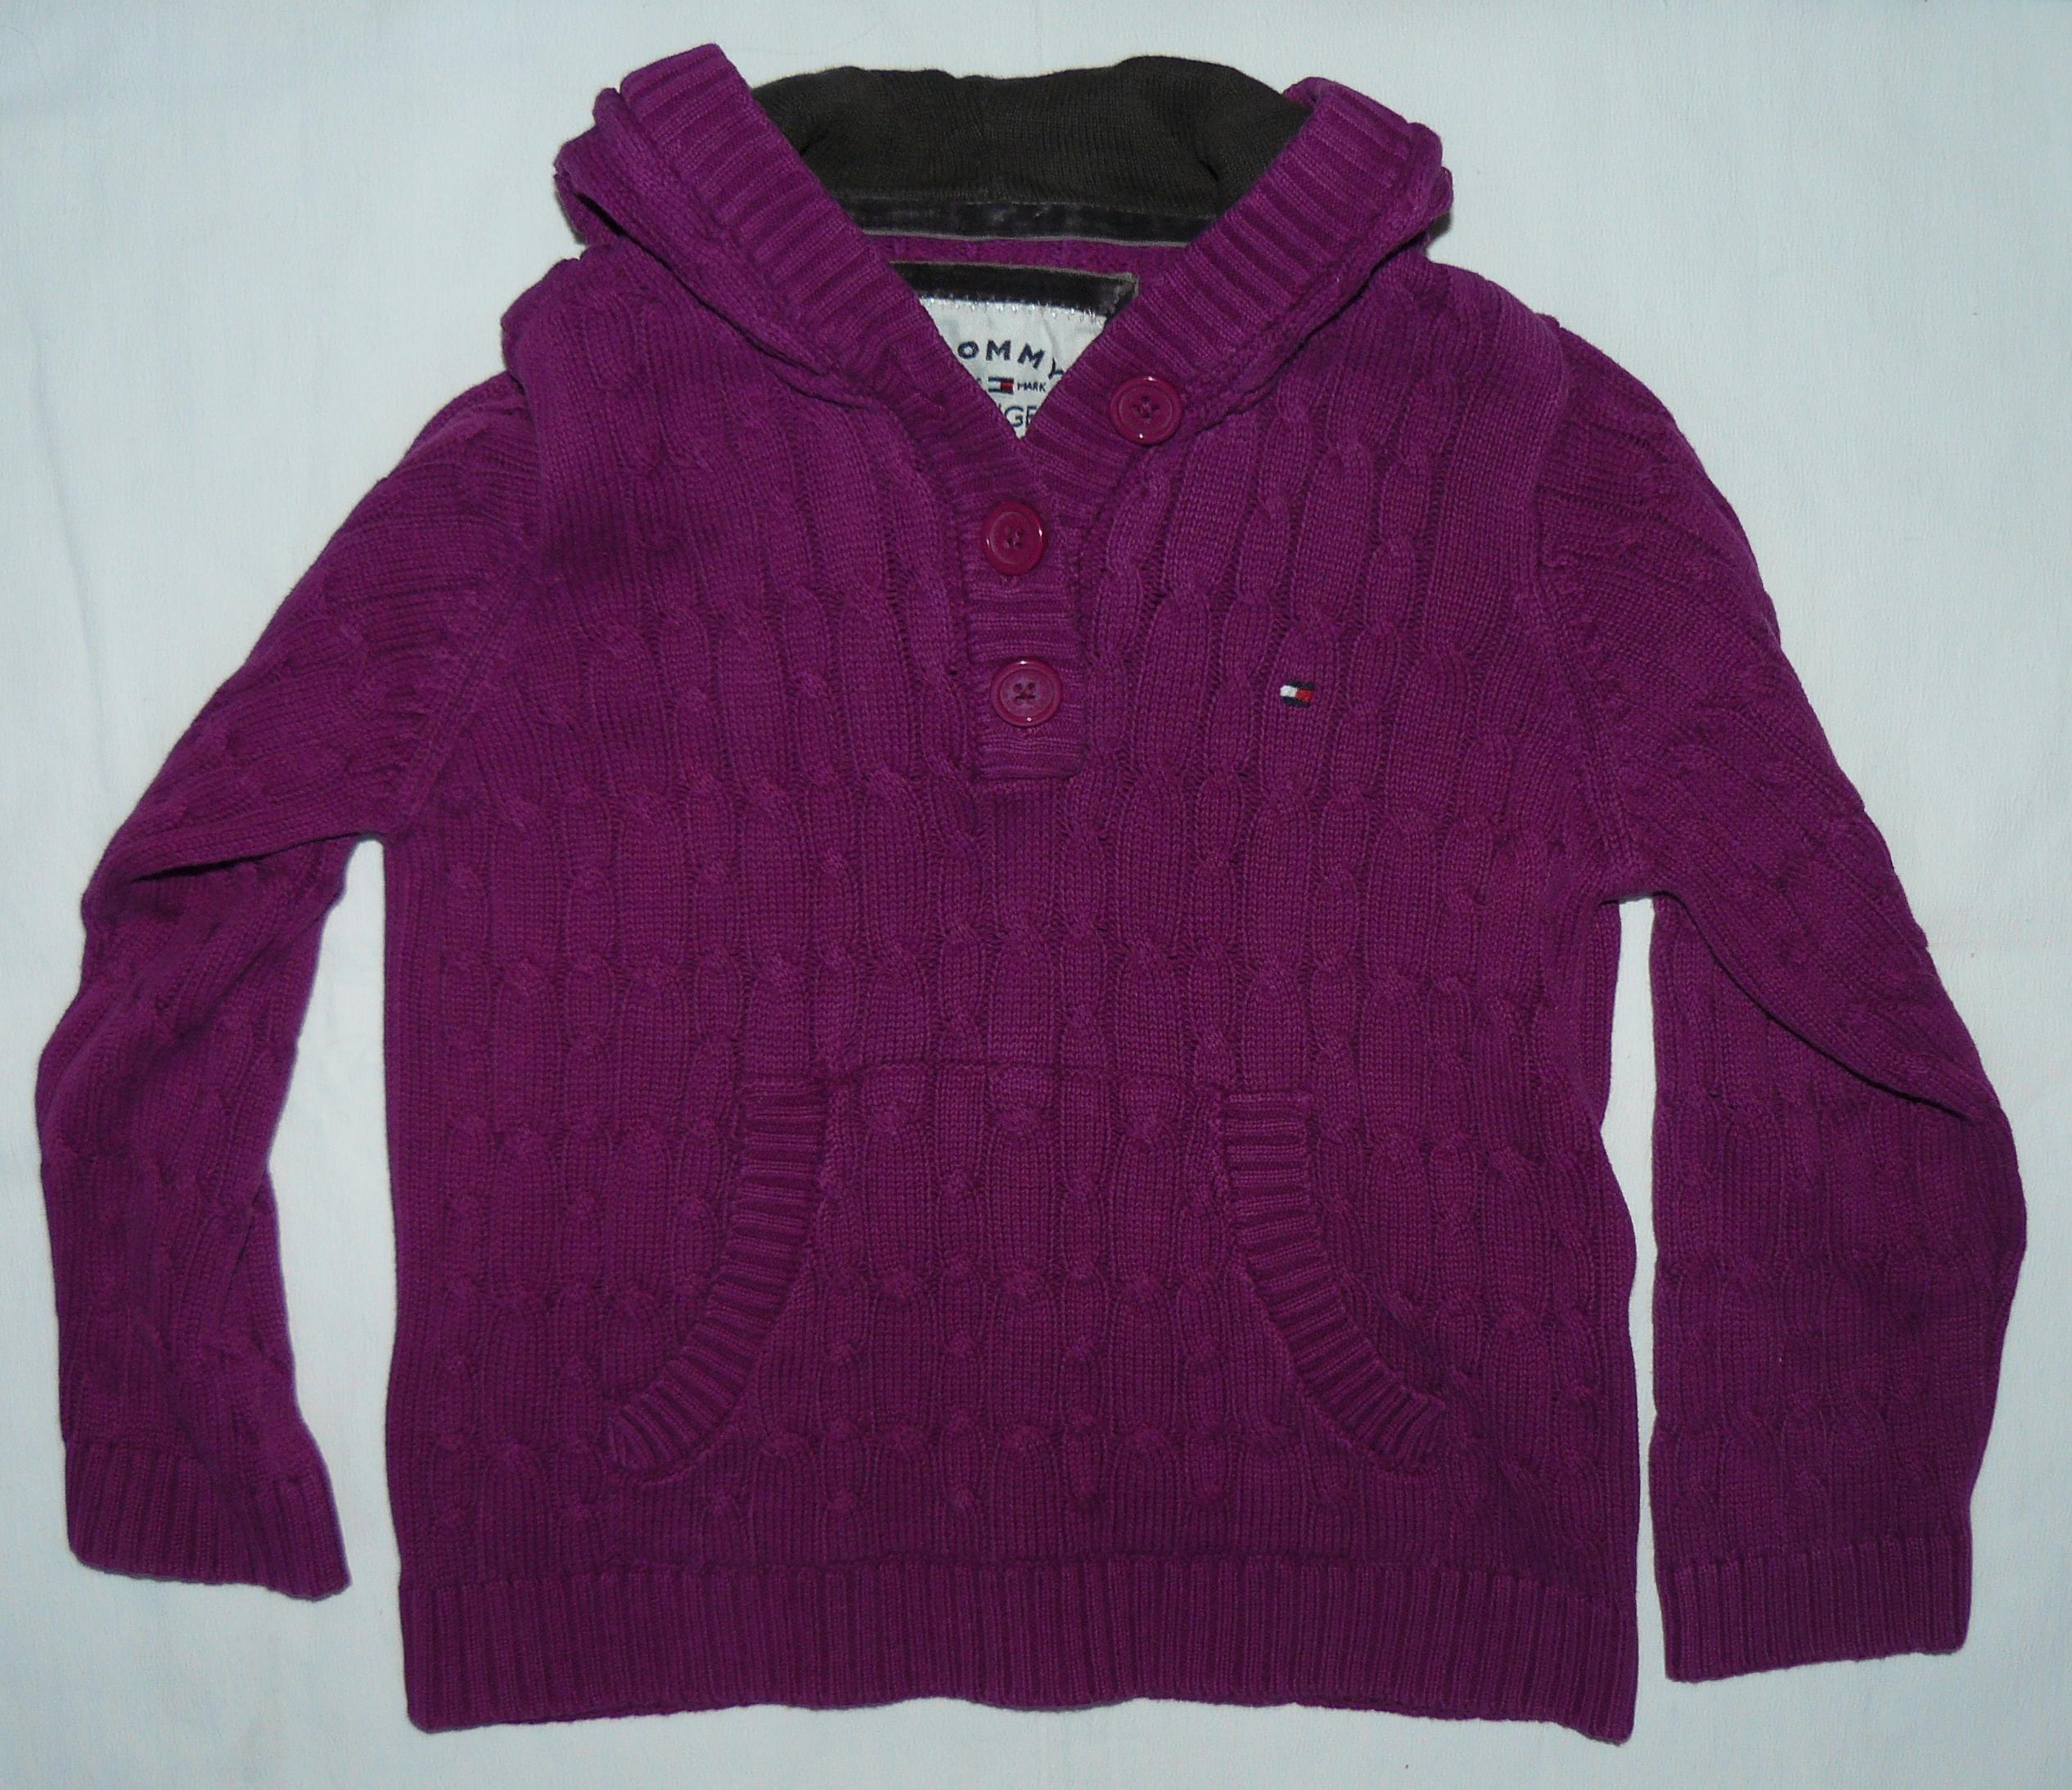 Sweterek słodki TOMMY HILFIGER 98 / 2-3 lat * ZIMA